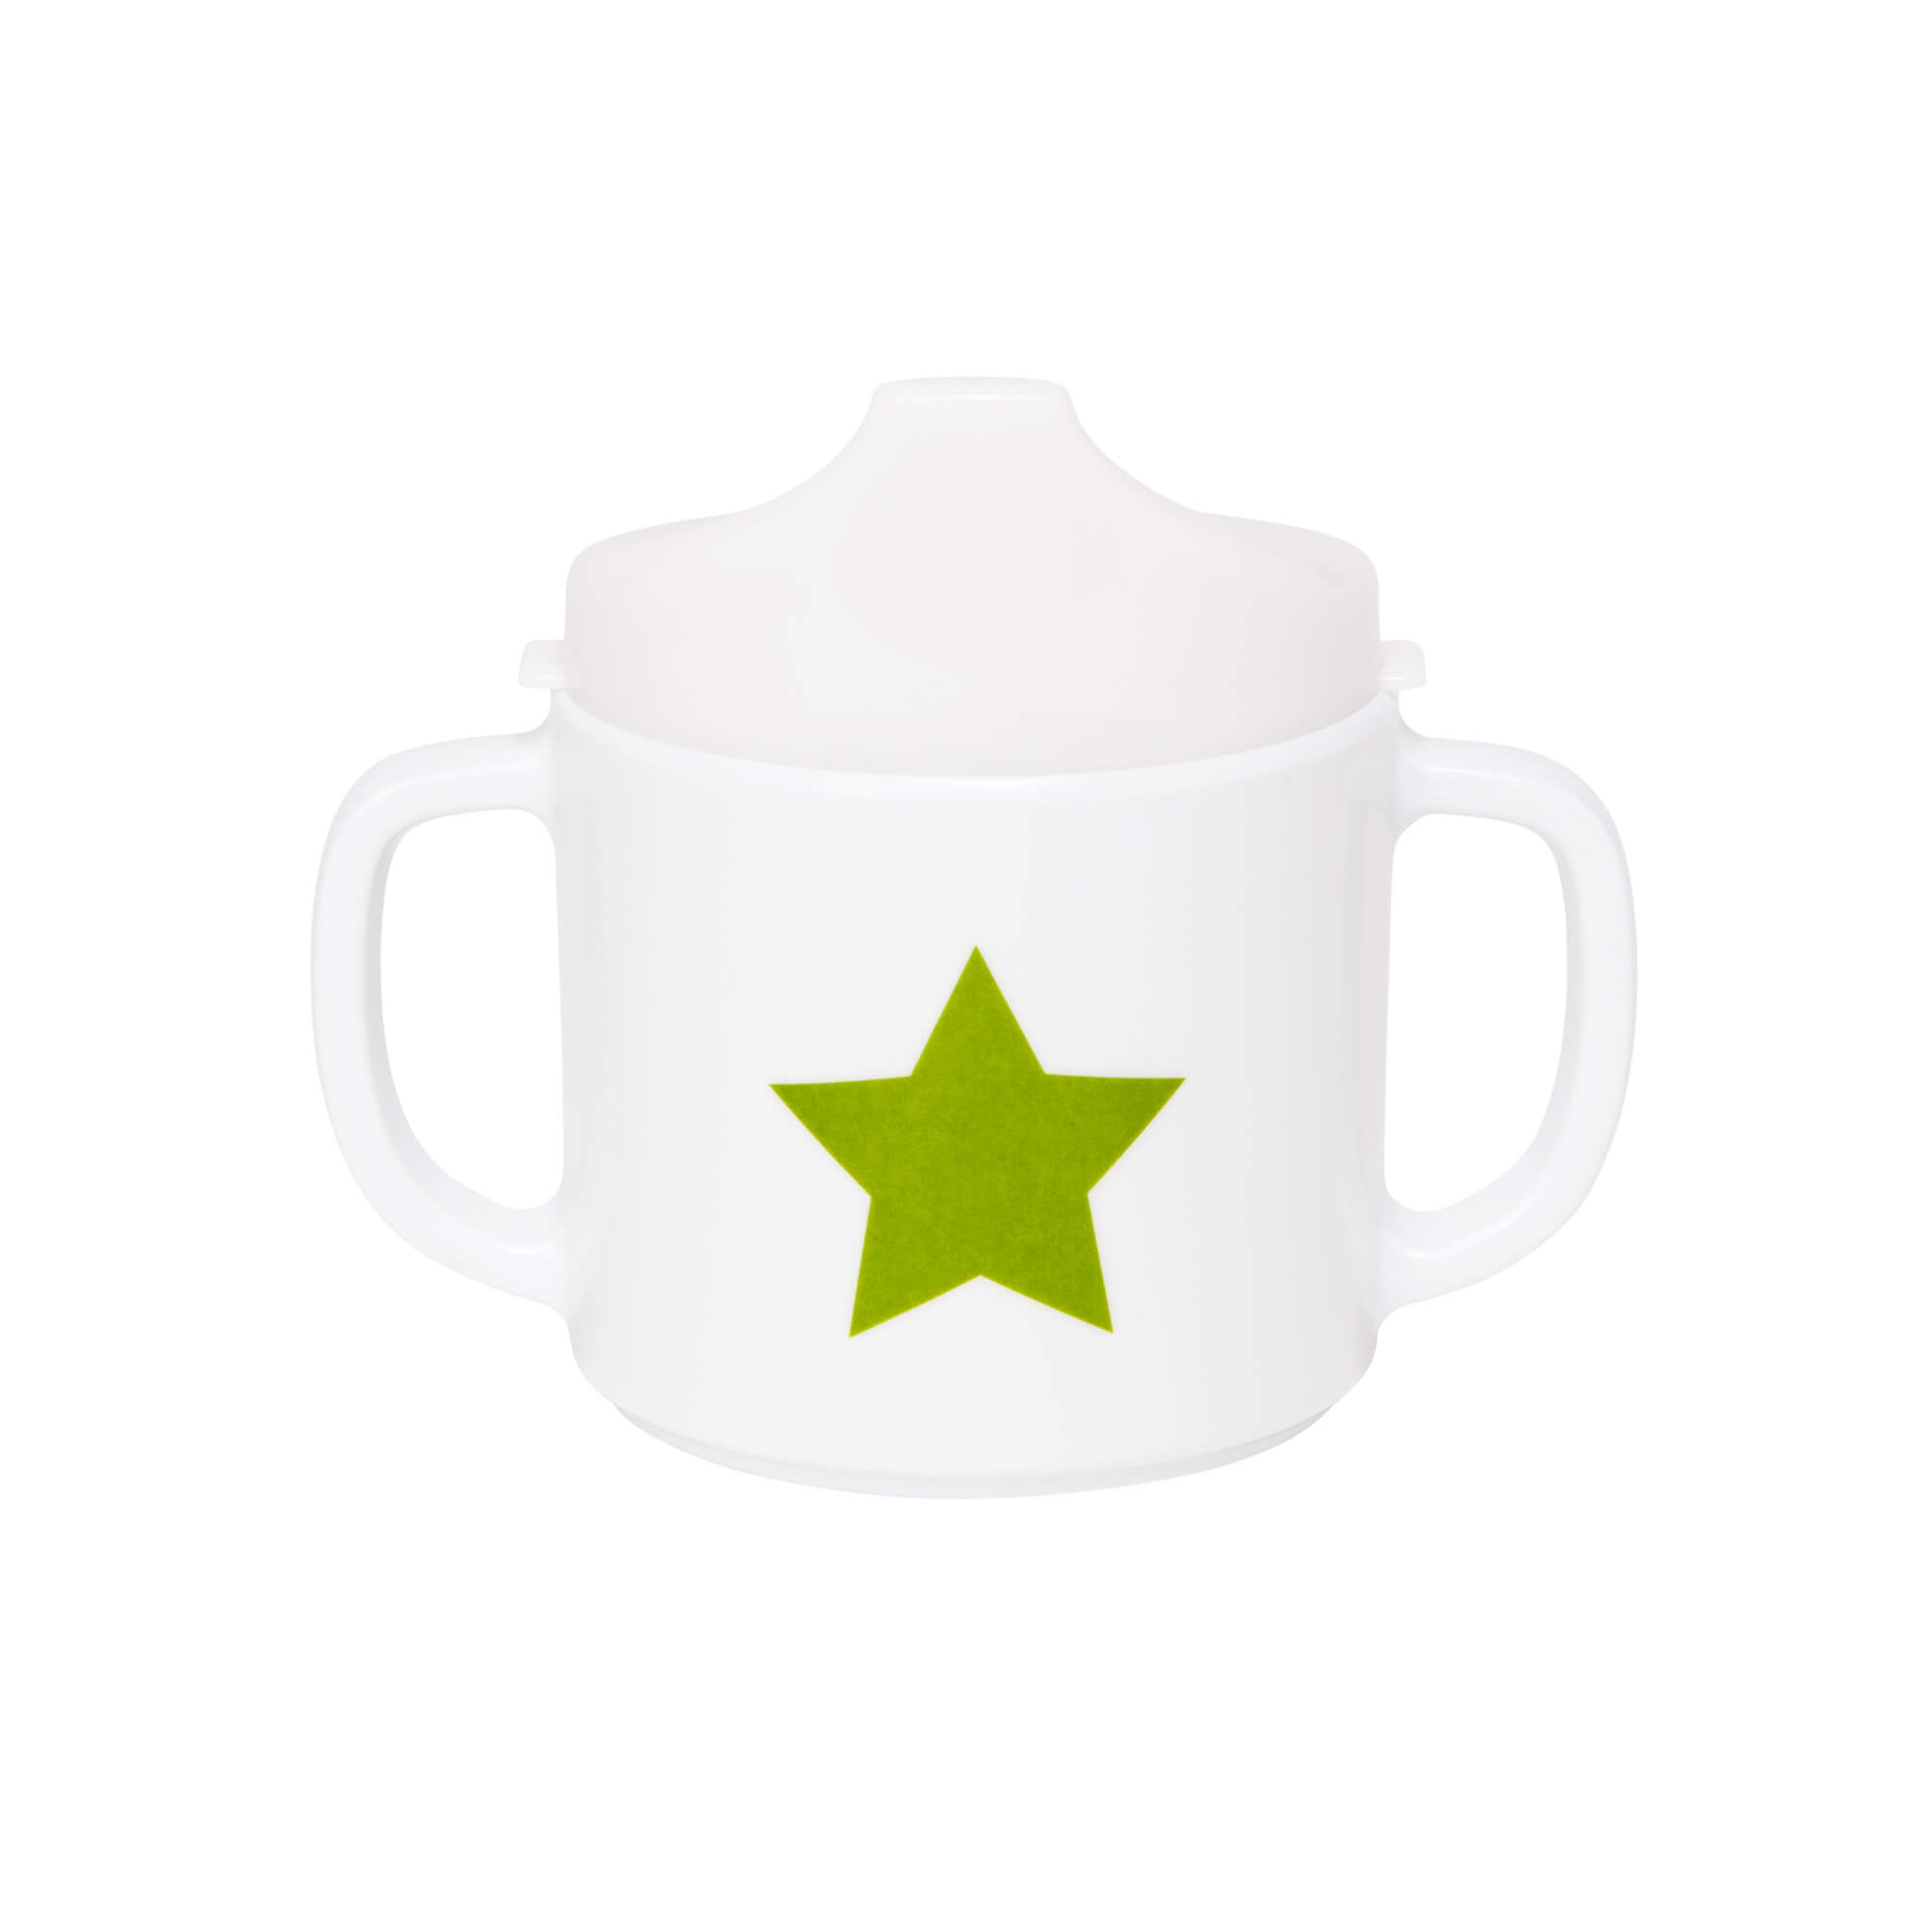 Lässig trinkbecher dish cup starlight olive lÄssig fashion